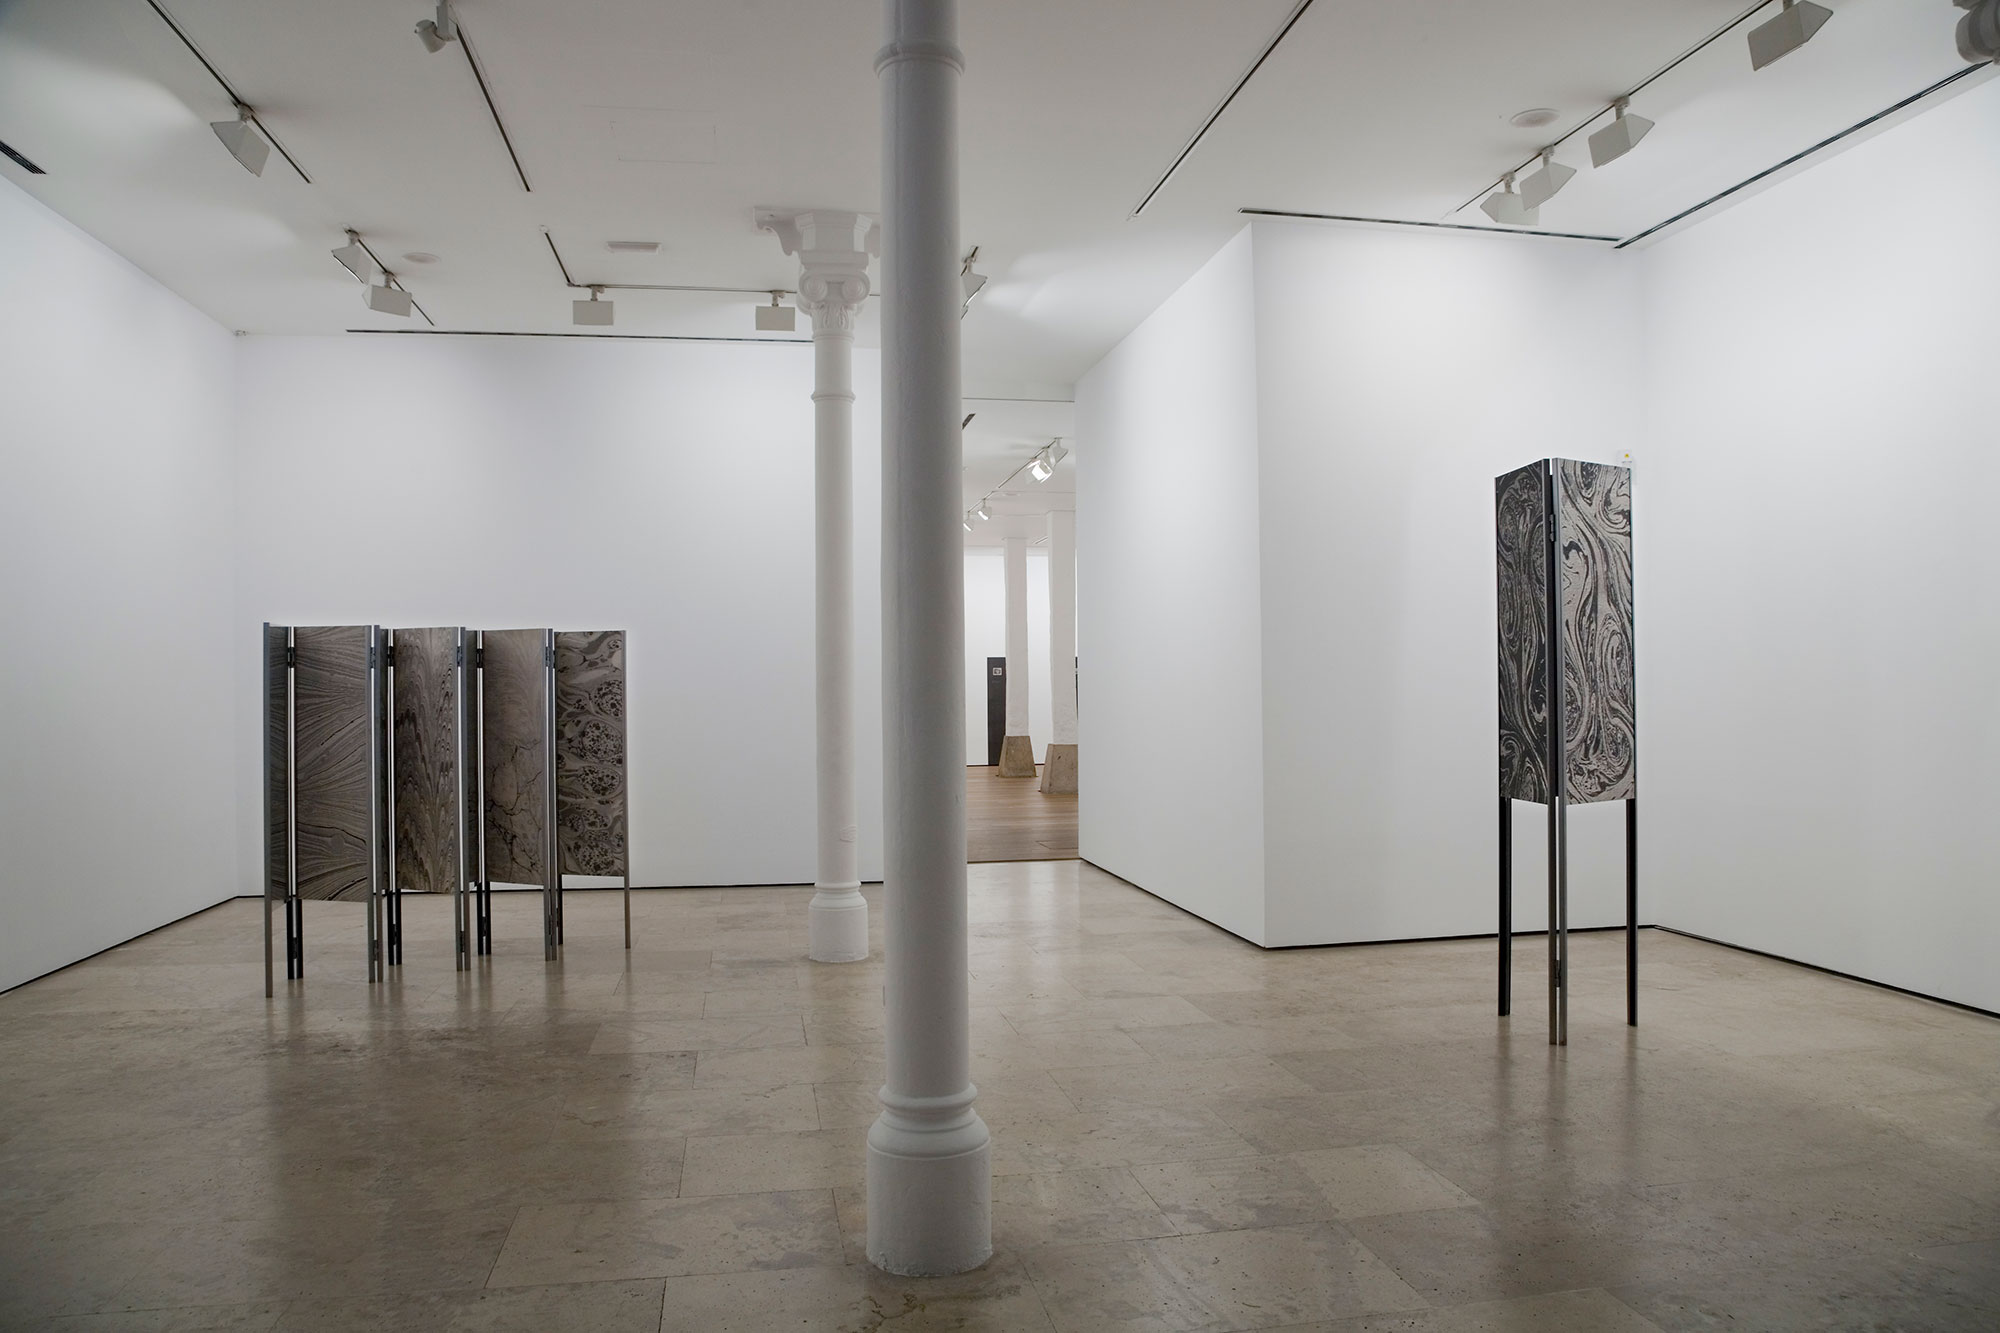 Erlea Maneros Zabala (2012) - Pilgrimages for a New Economy